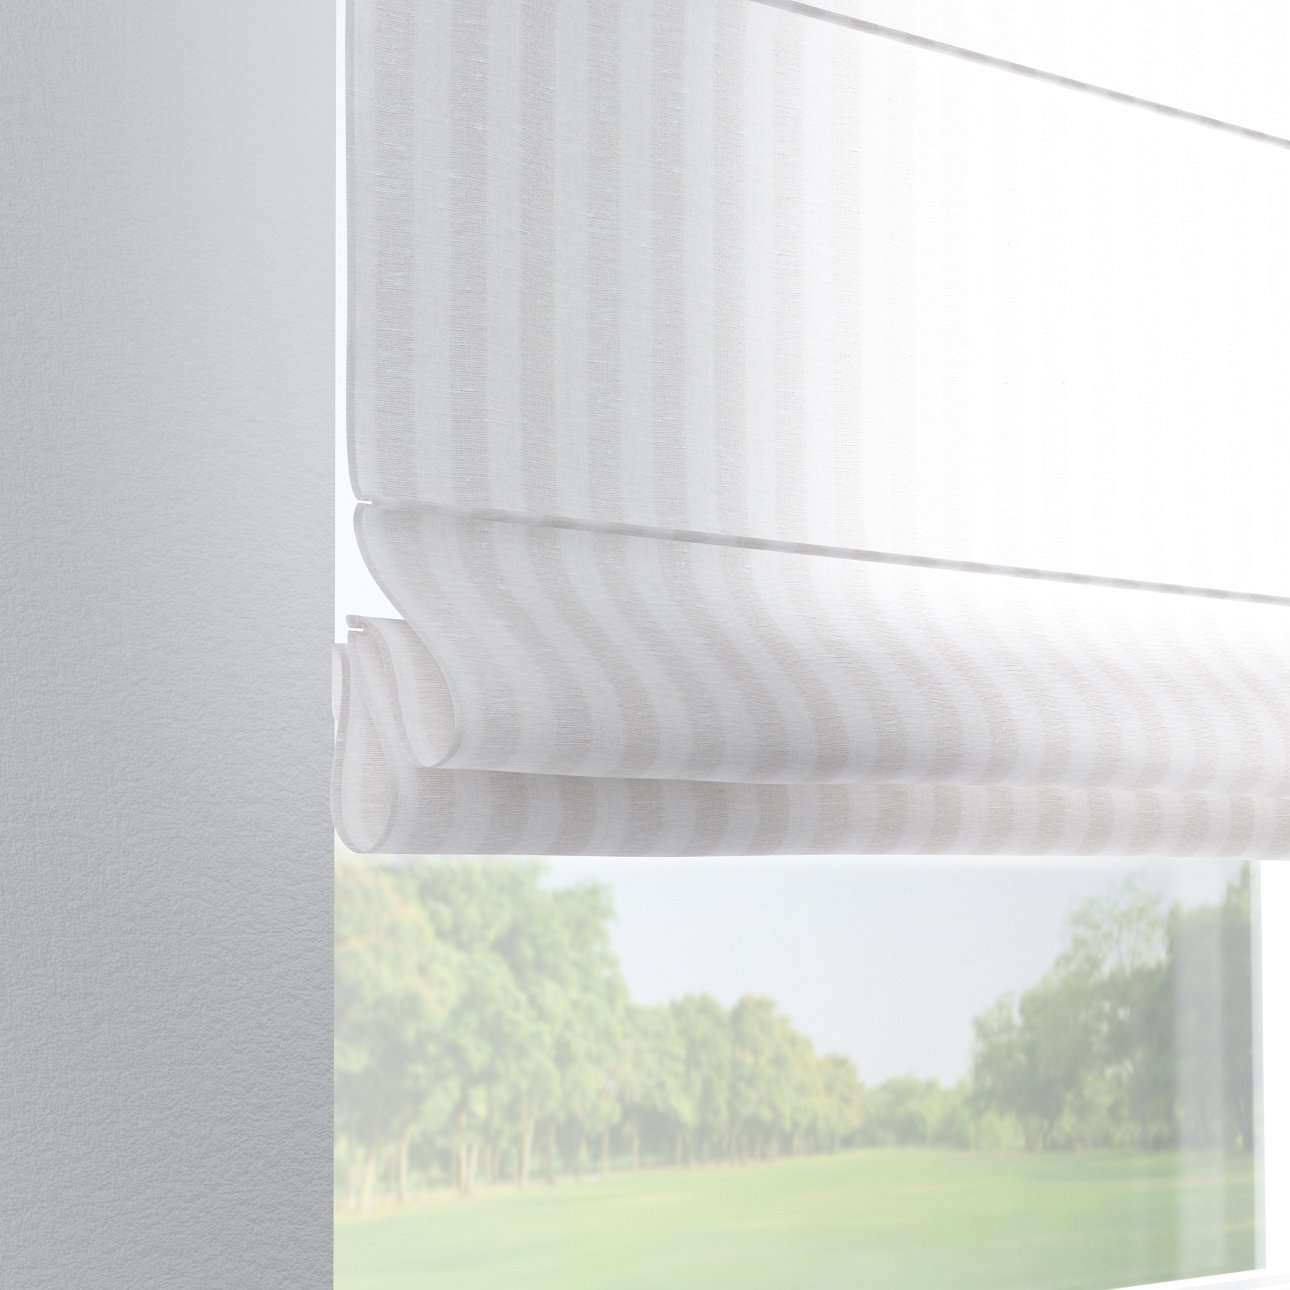 Foldegardin Verona<br/>Med stropper til gardinstang 80 x 170 cm fra kollektionen Linen, Stof: 392-03